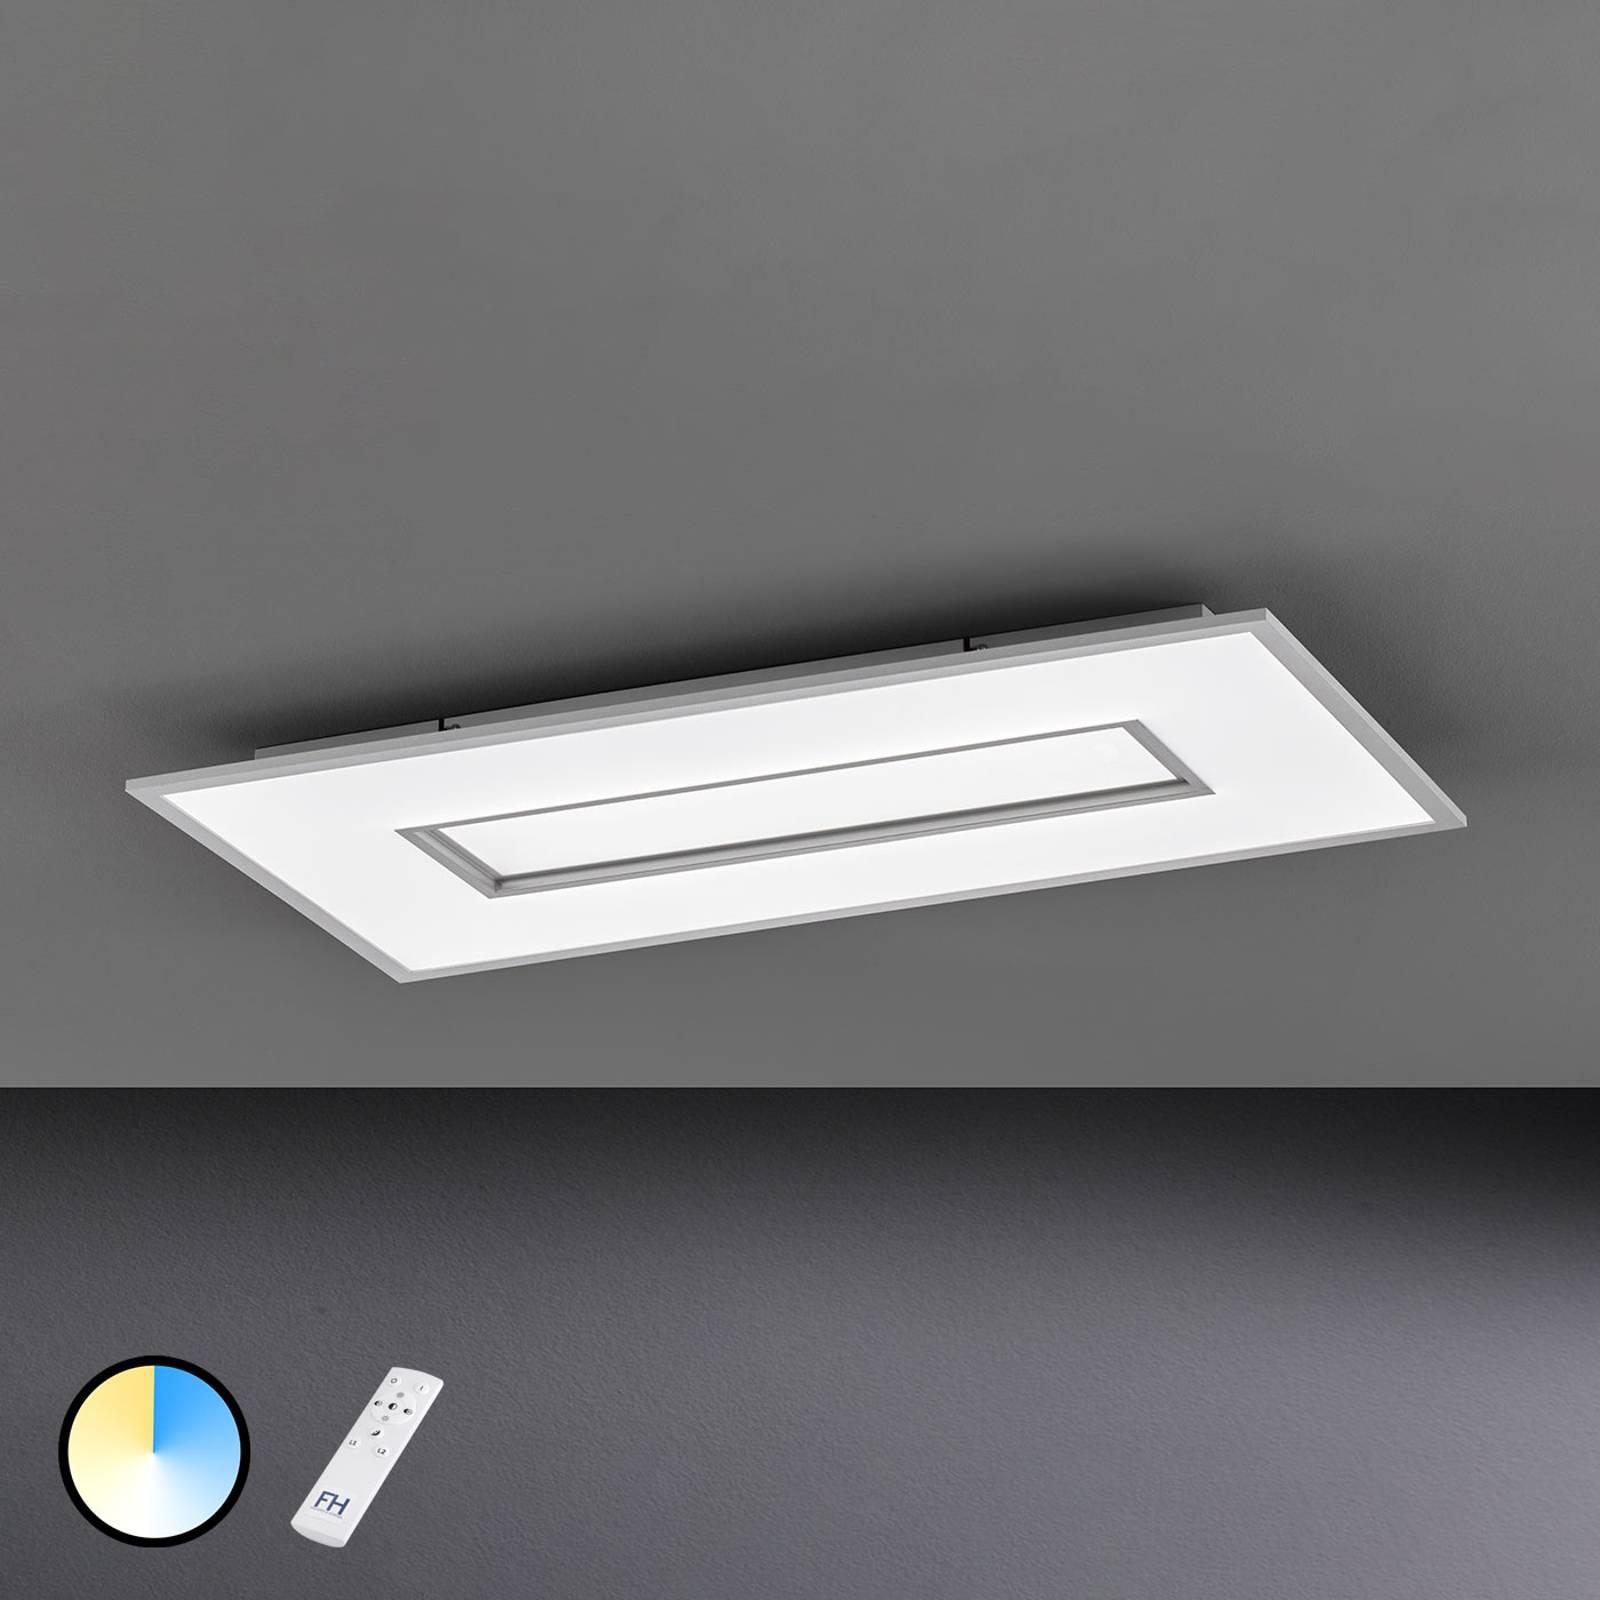 LED plafondlamp Tiara rechthoek 80x40 cm